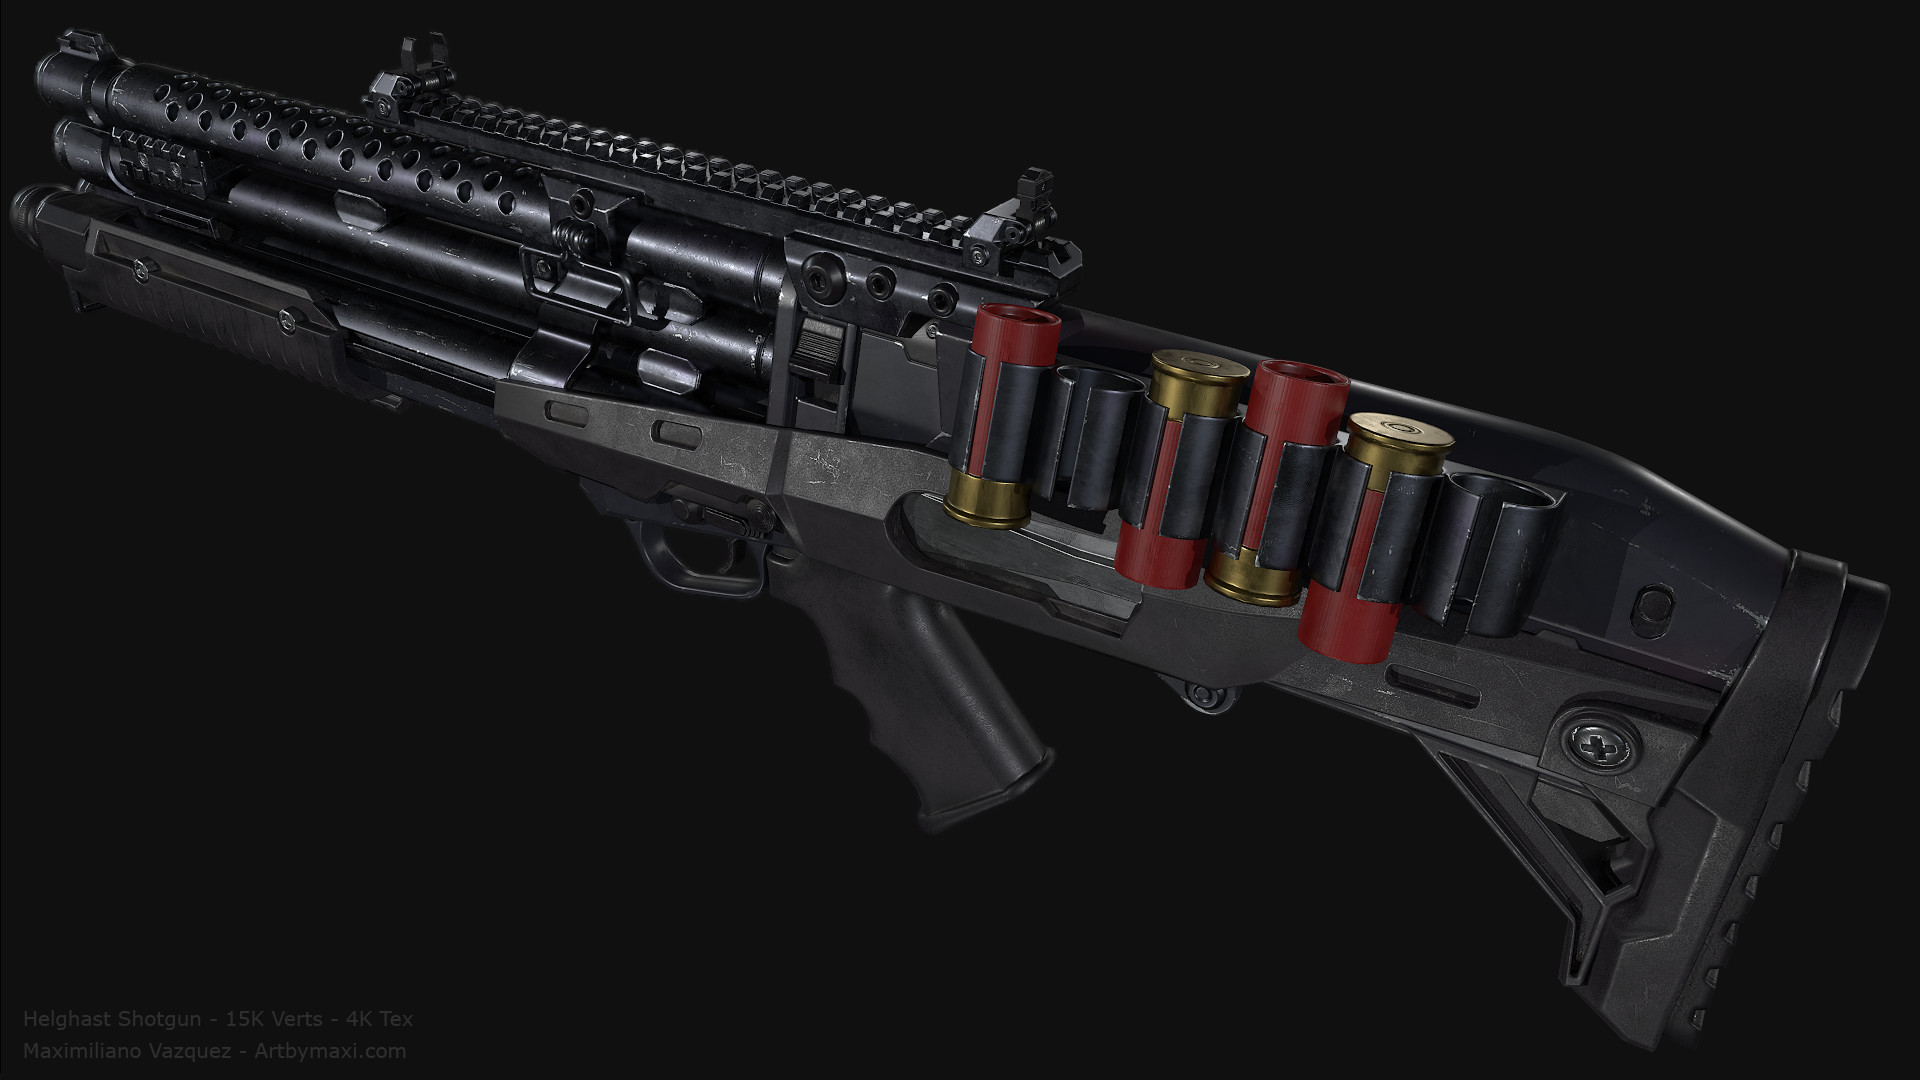 Maximiliano vazquez hellghast shotgun lp1